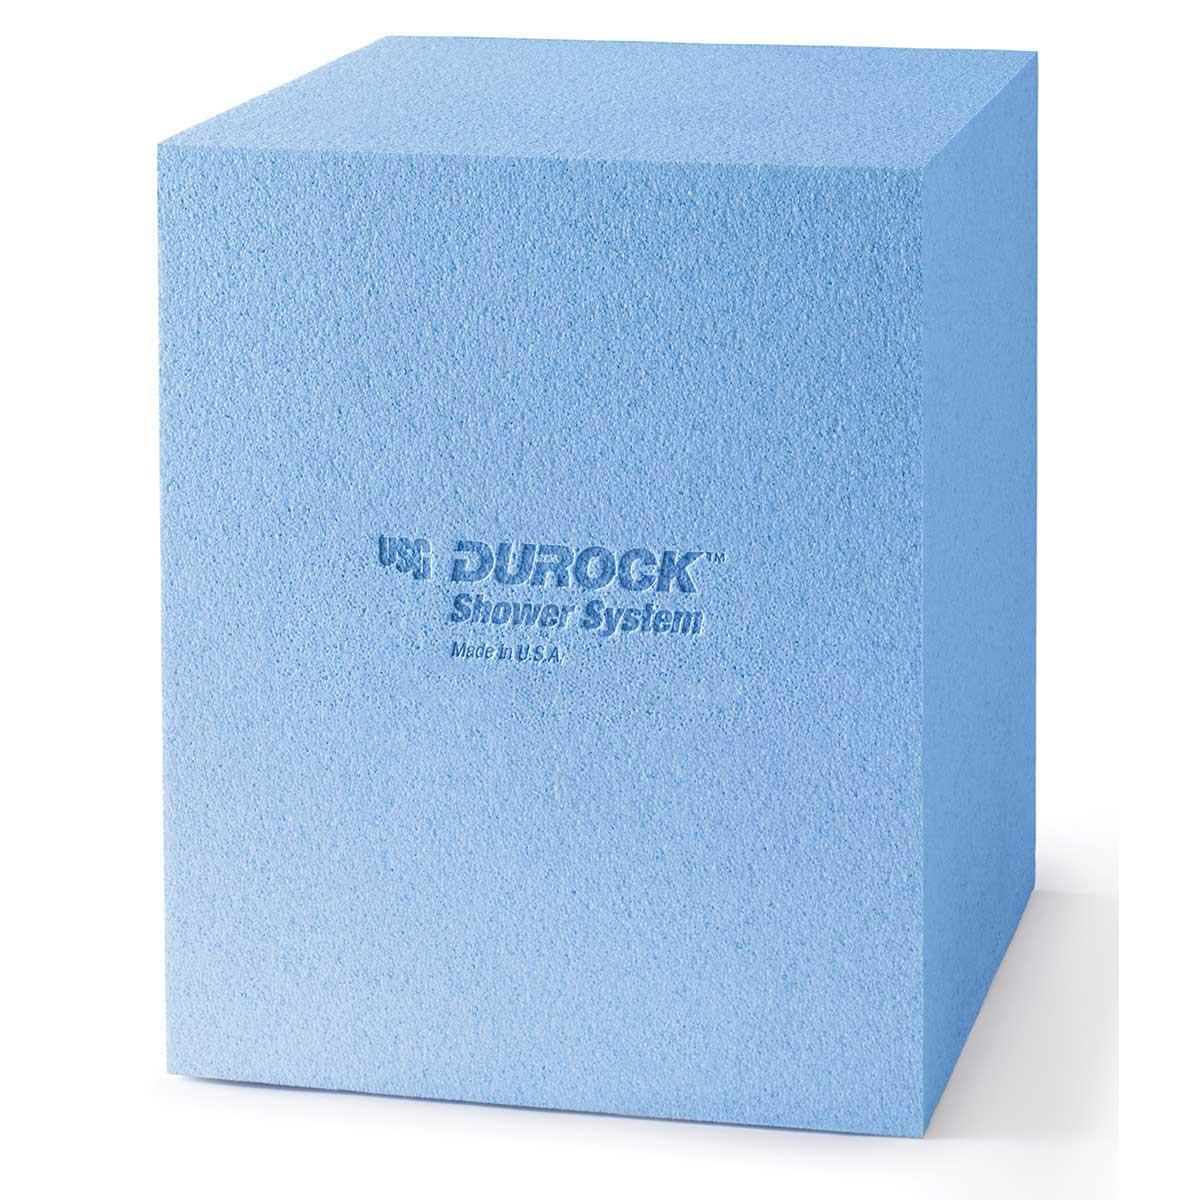 170139 16x16 Square Seat USG Durock